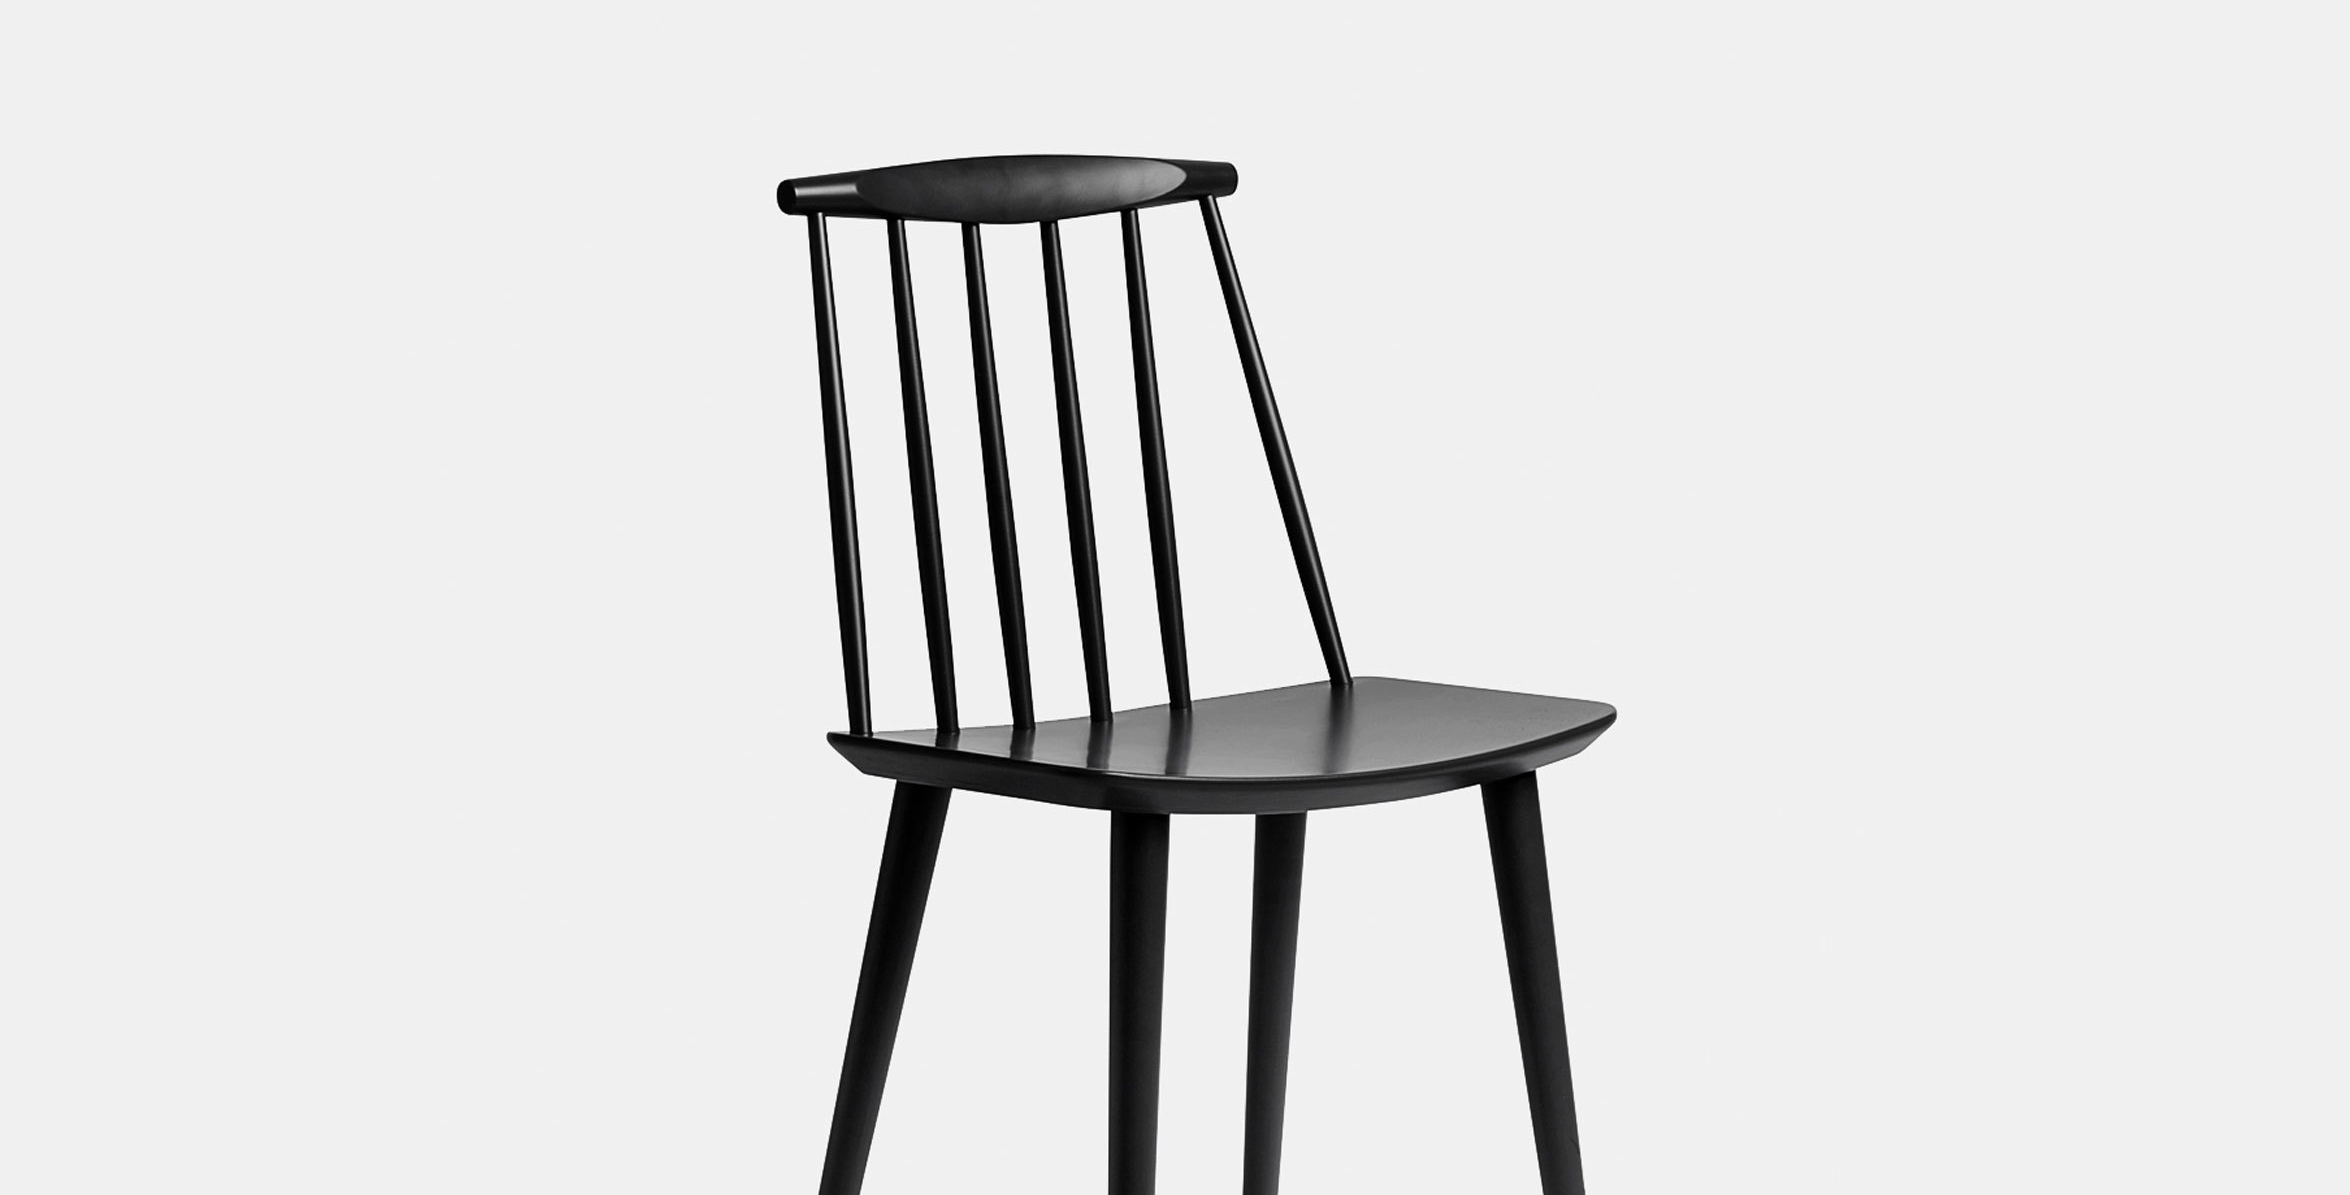 Designer Folke Palsson